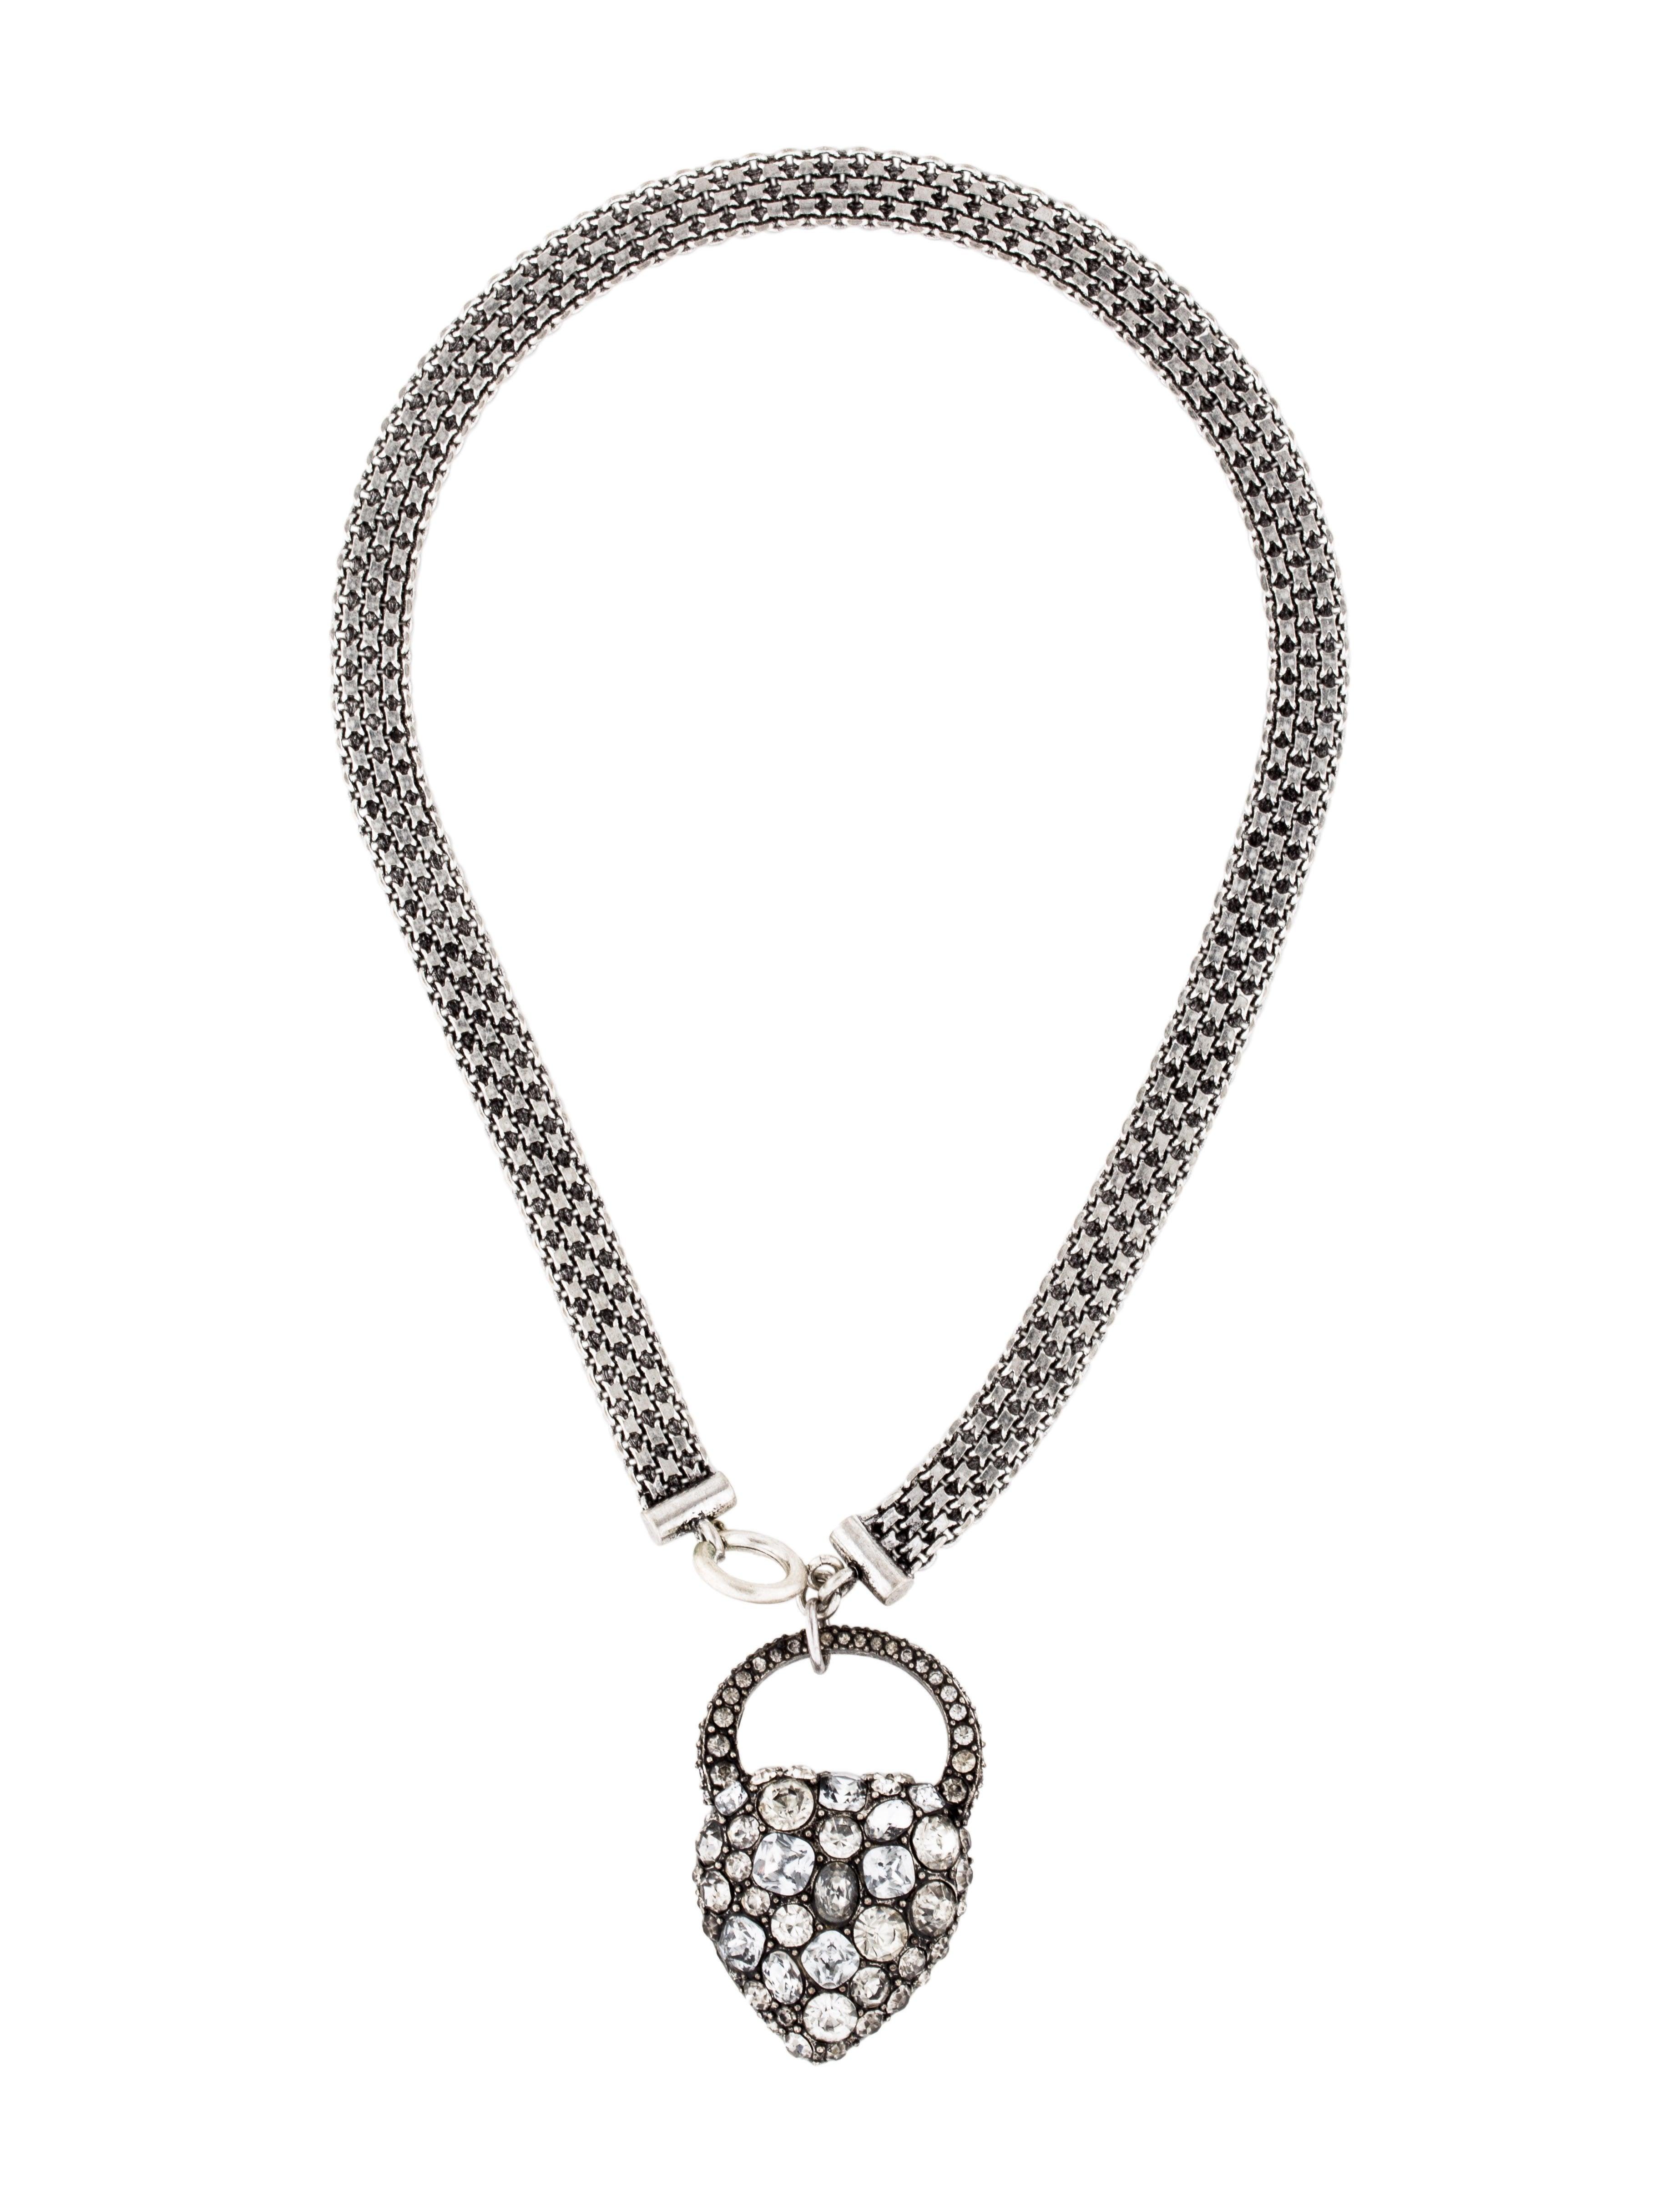 Lulu Frost Nina Crystal Heart Lock Necklace 4wLcxTq4b